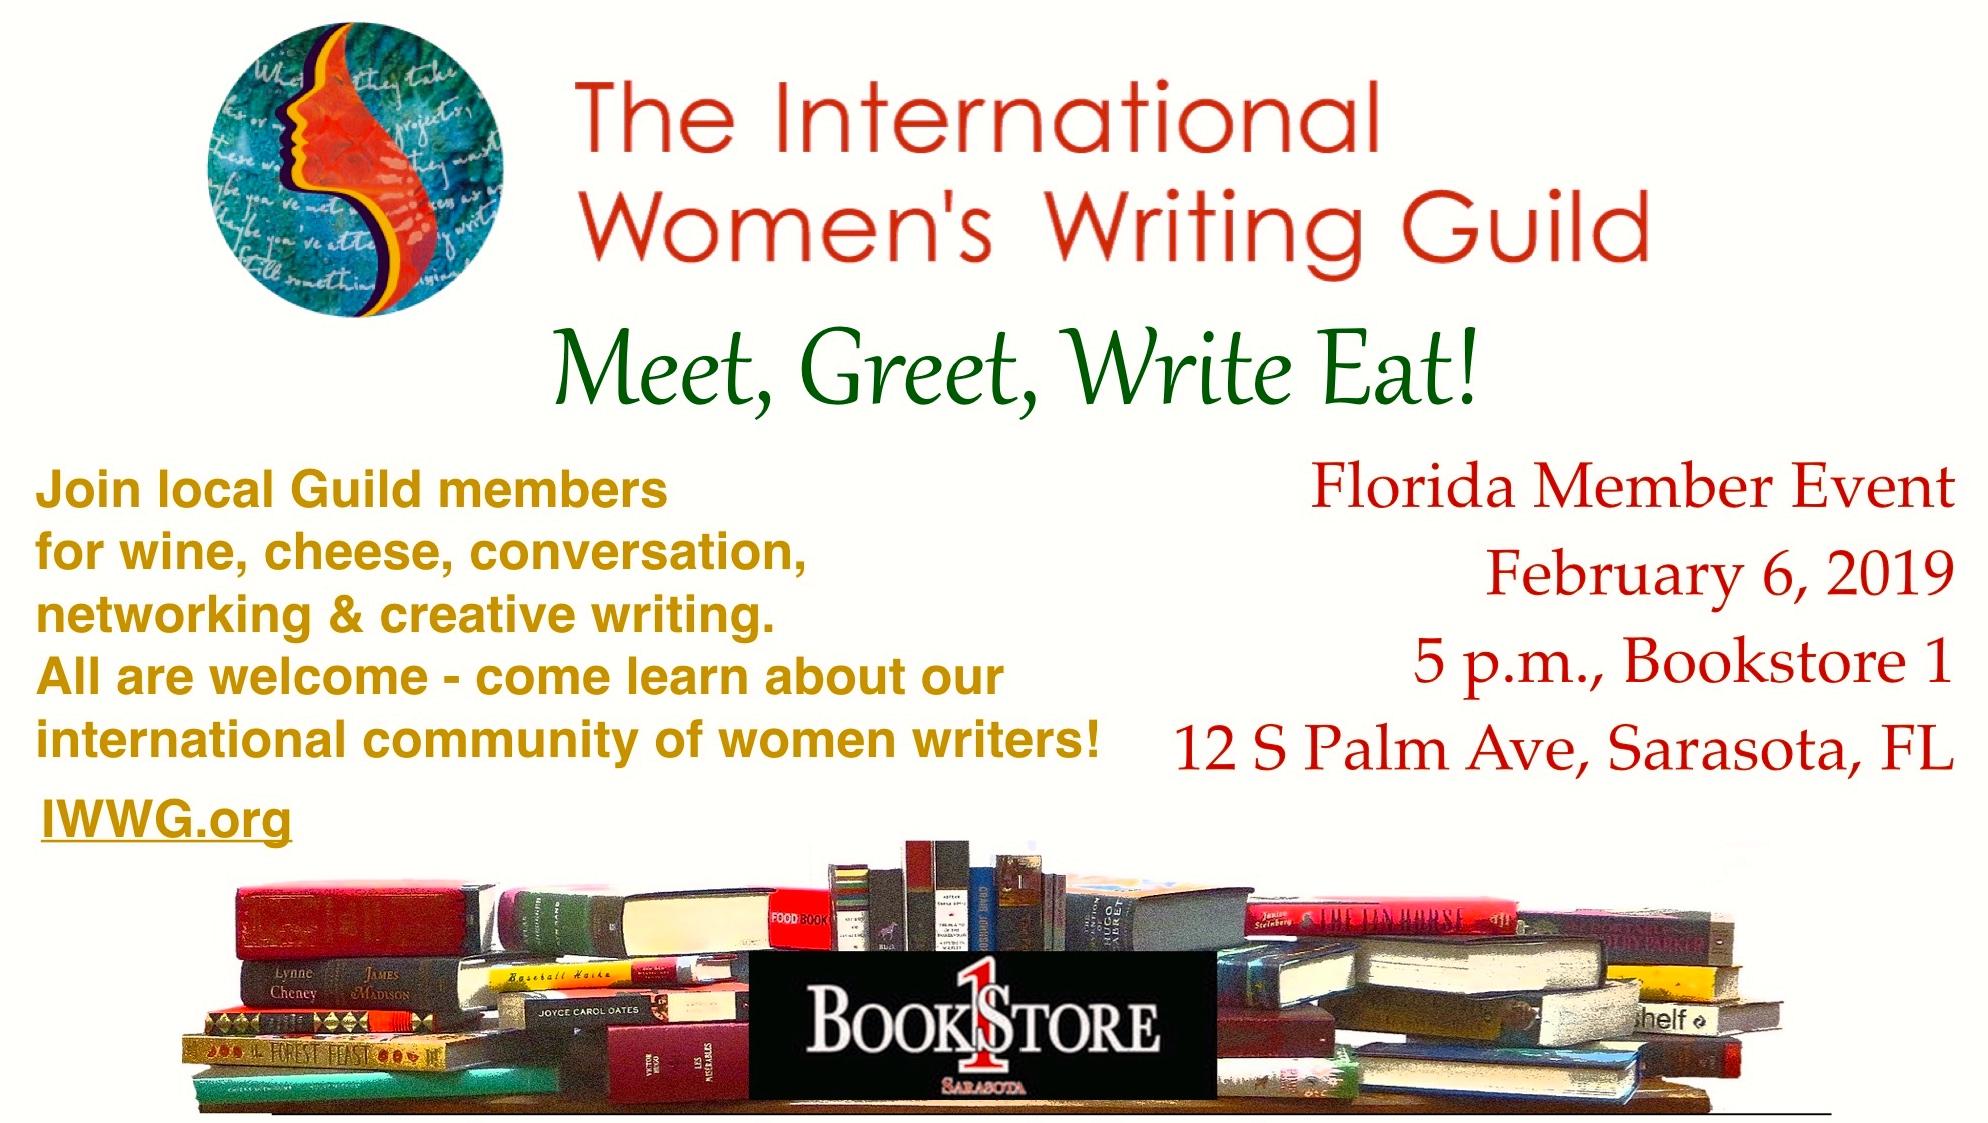 Bookstore 1 Member Event.jpg